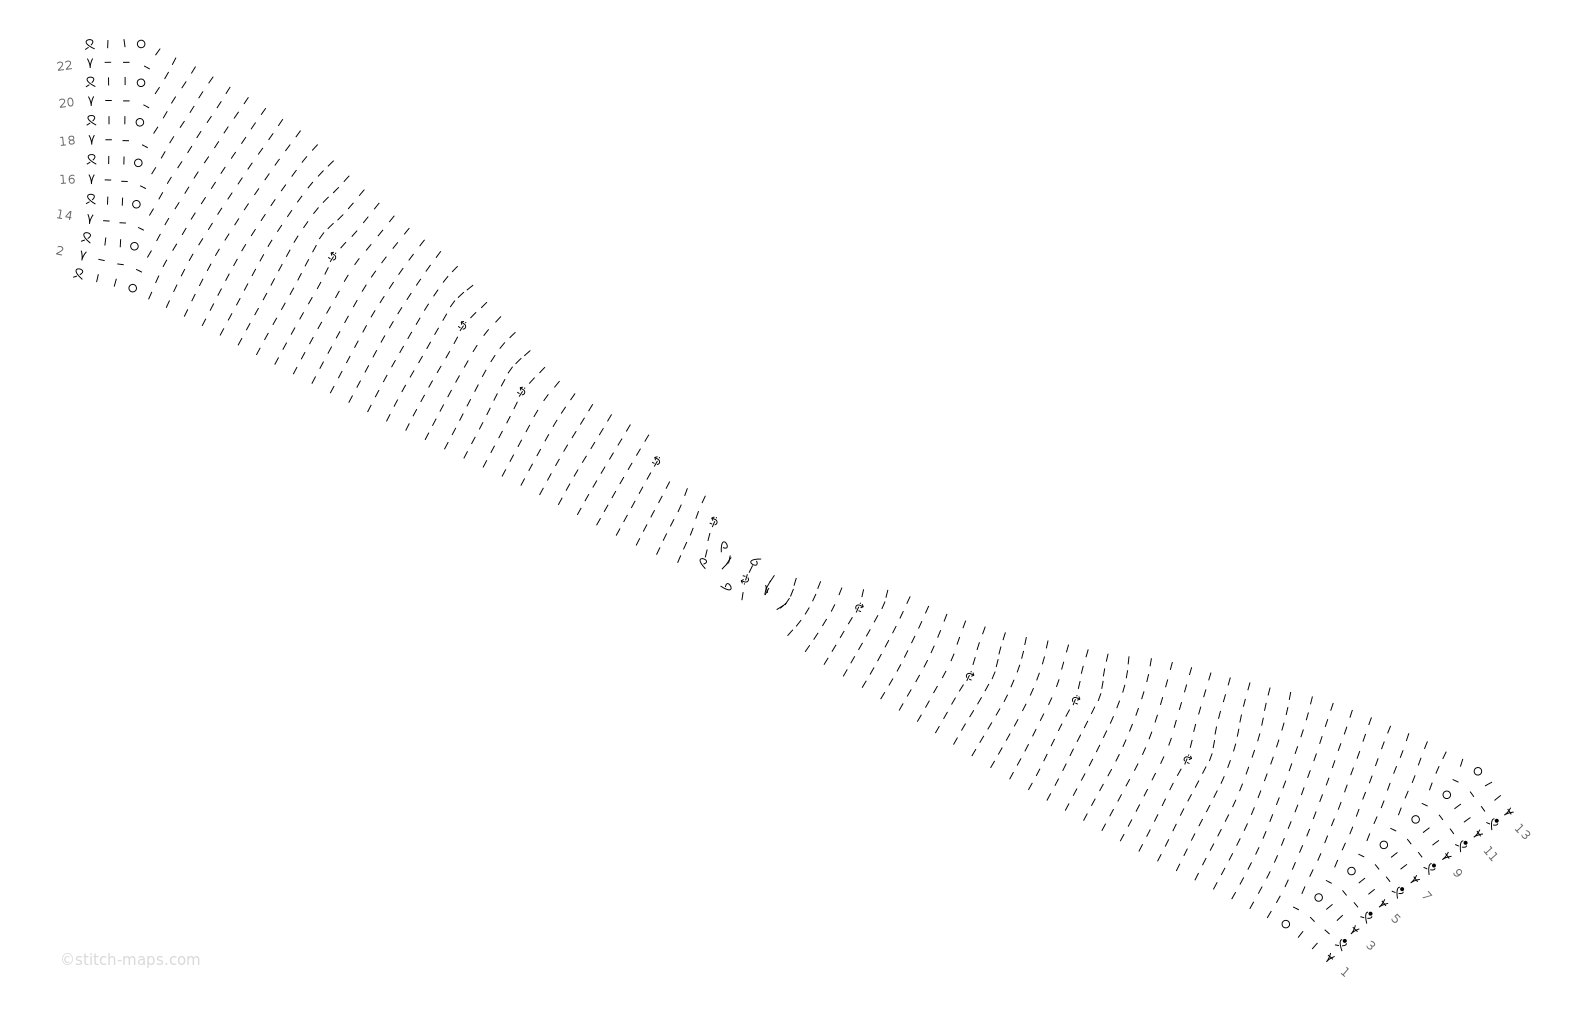 RMW Section B chart